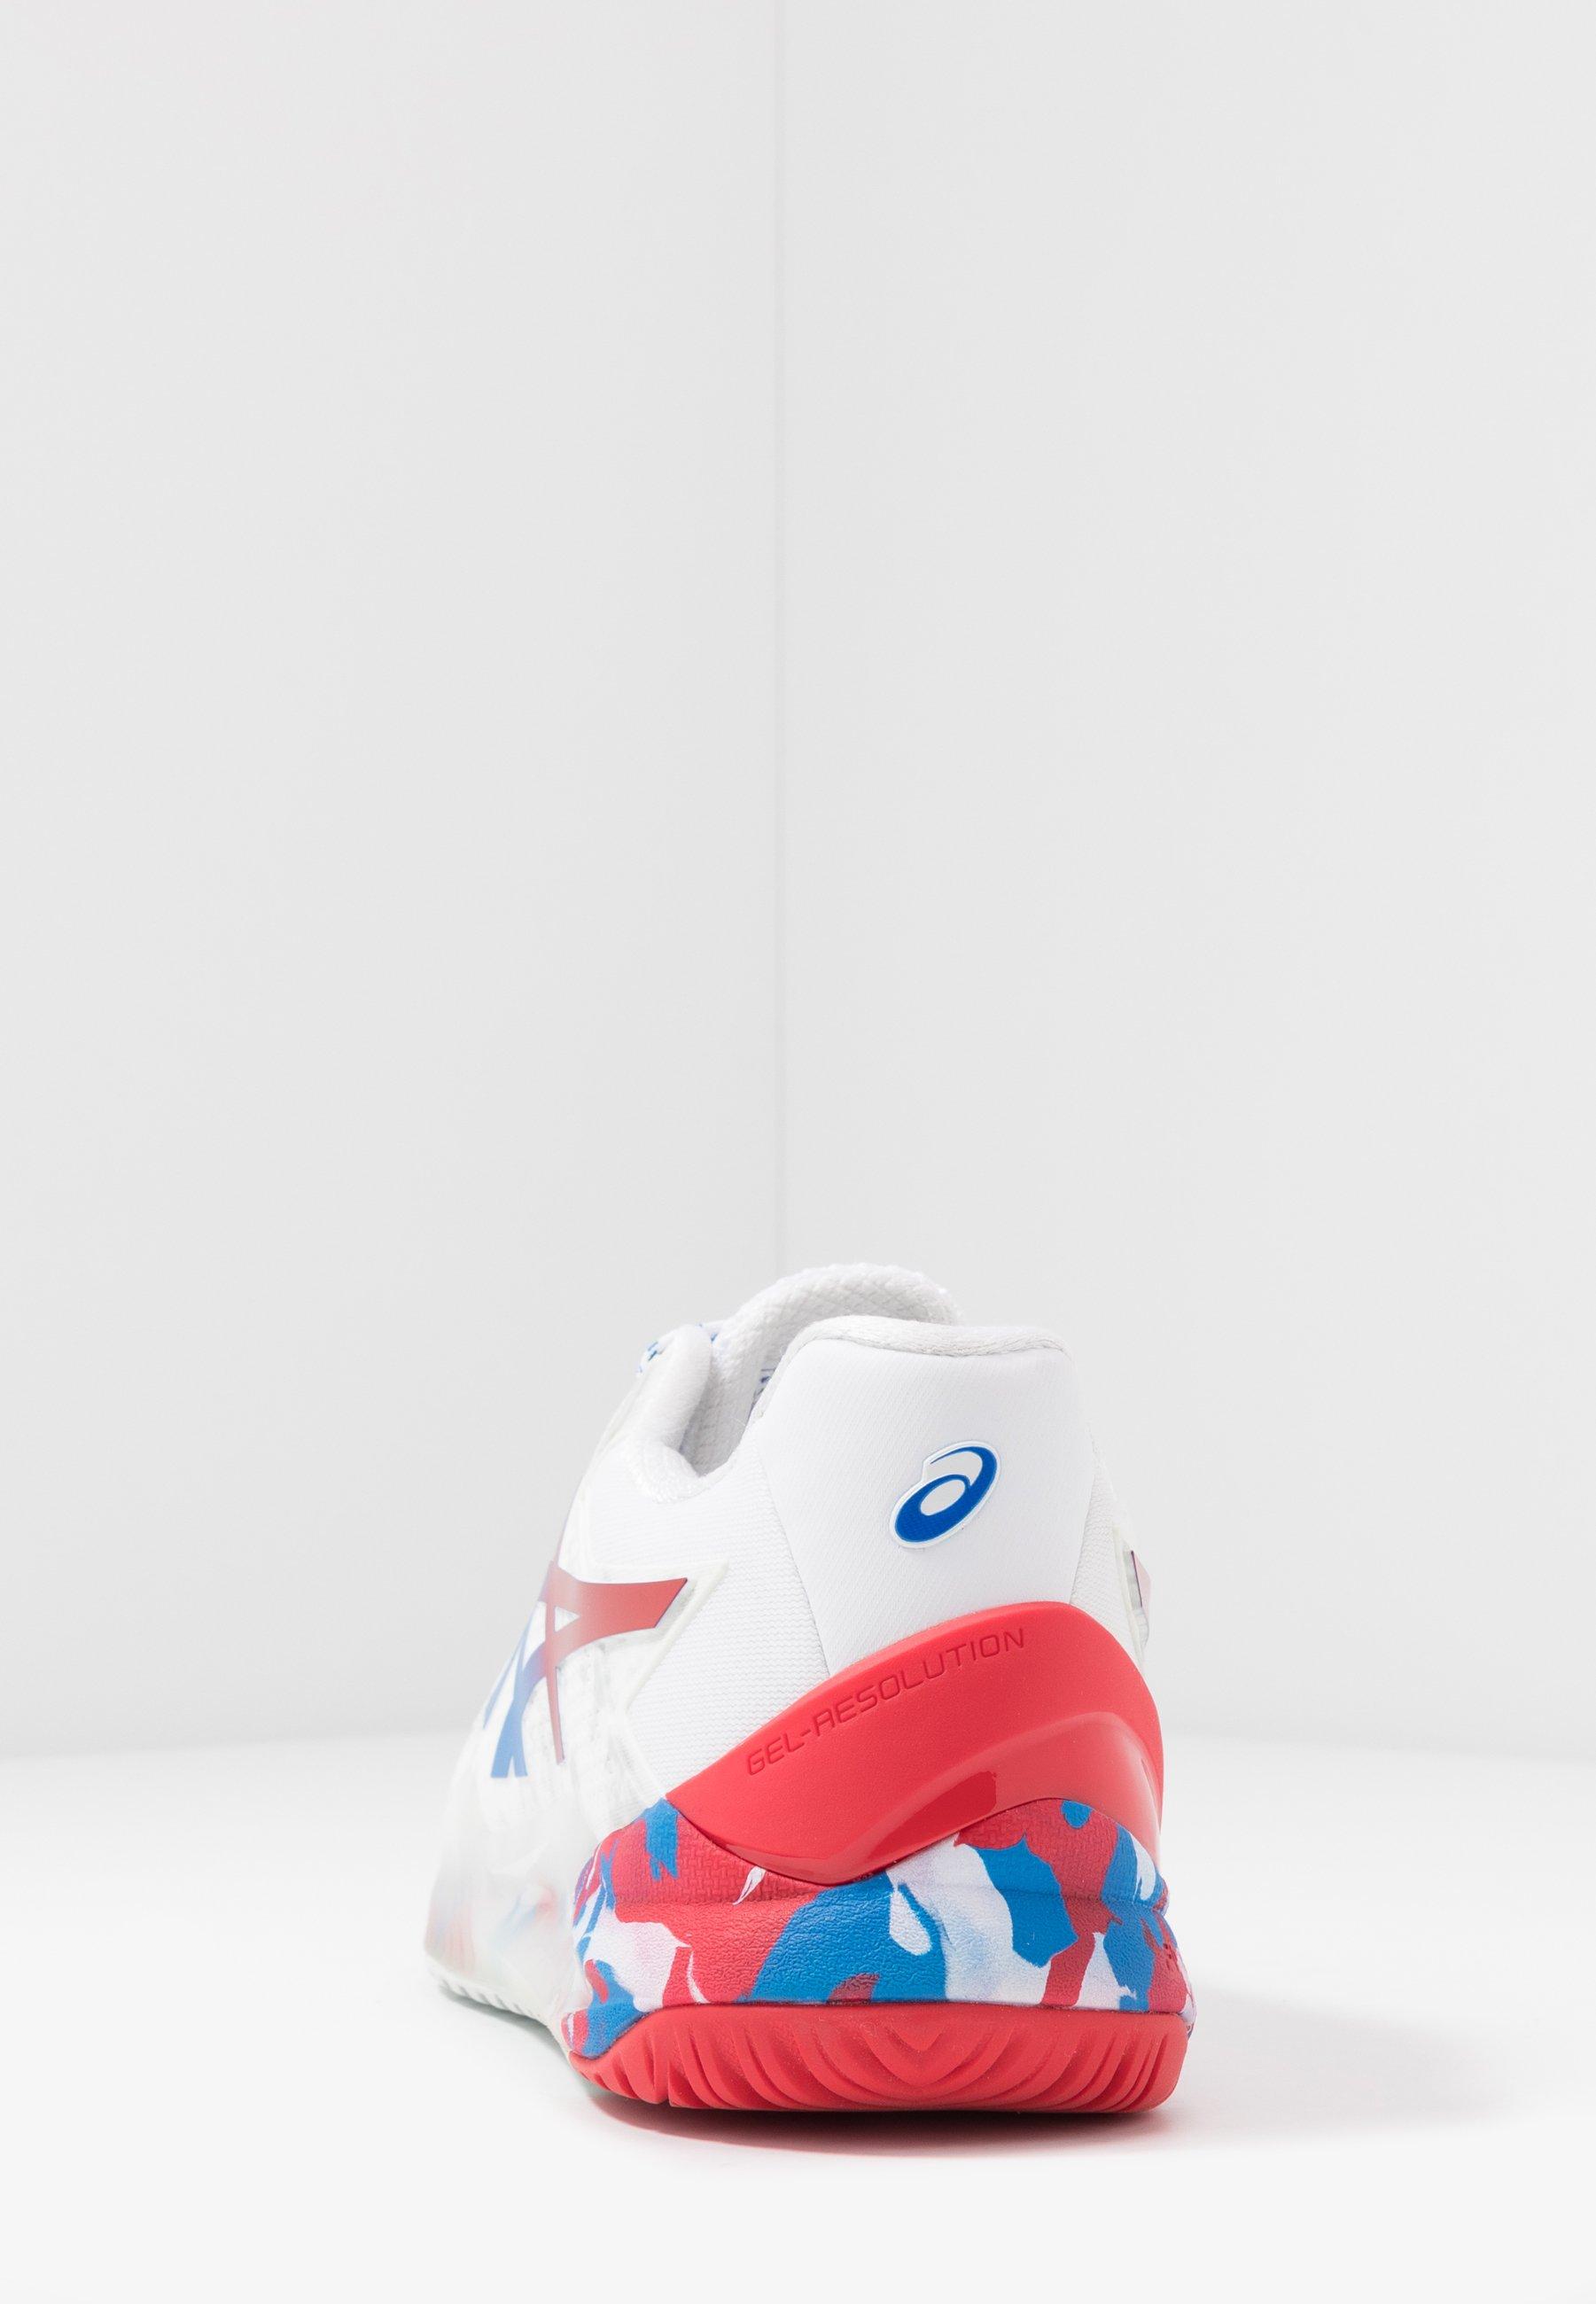 GEL RESOLUTION 8 Multicourt Tennisschuh whiteelectric blue